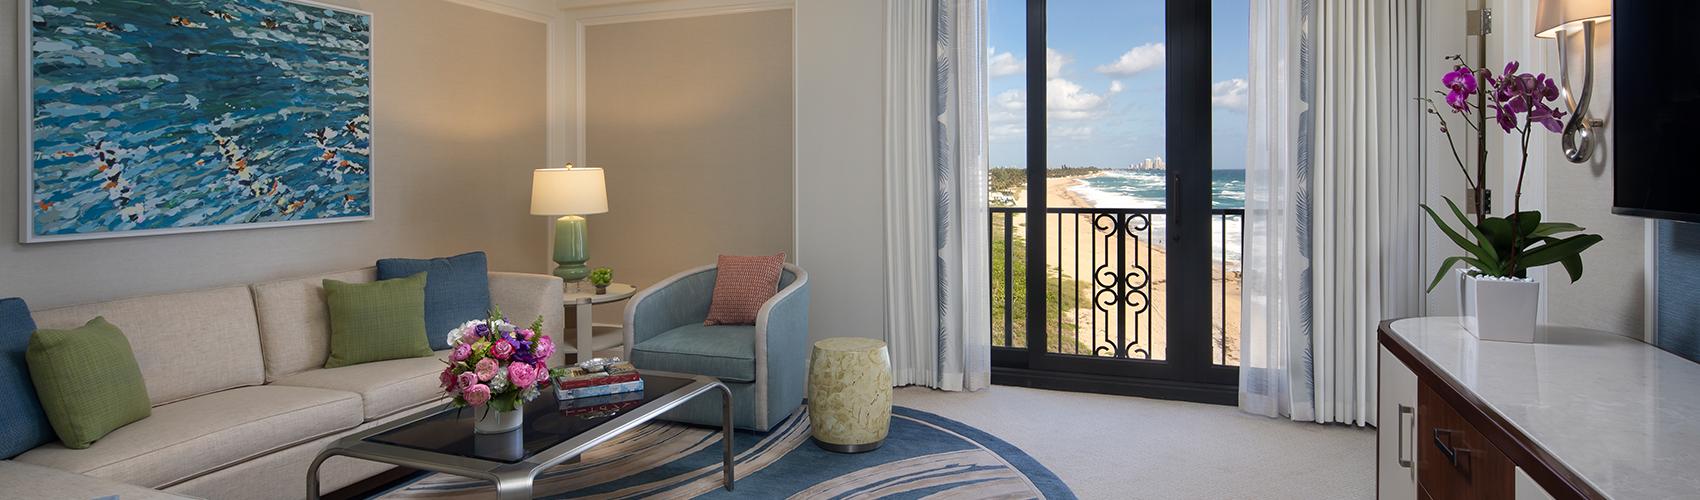 Atlantic Suite with Oceanfront View Living Room